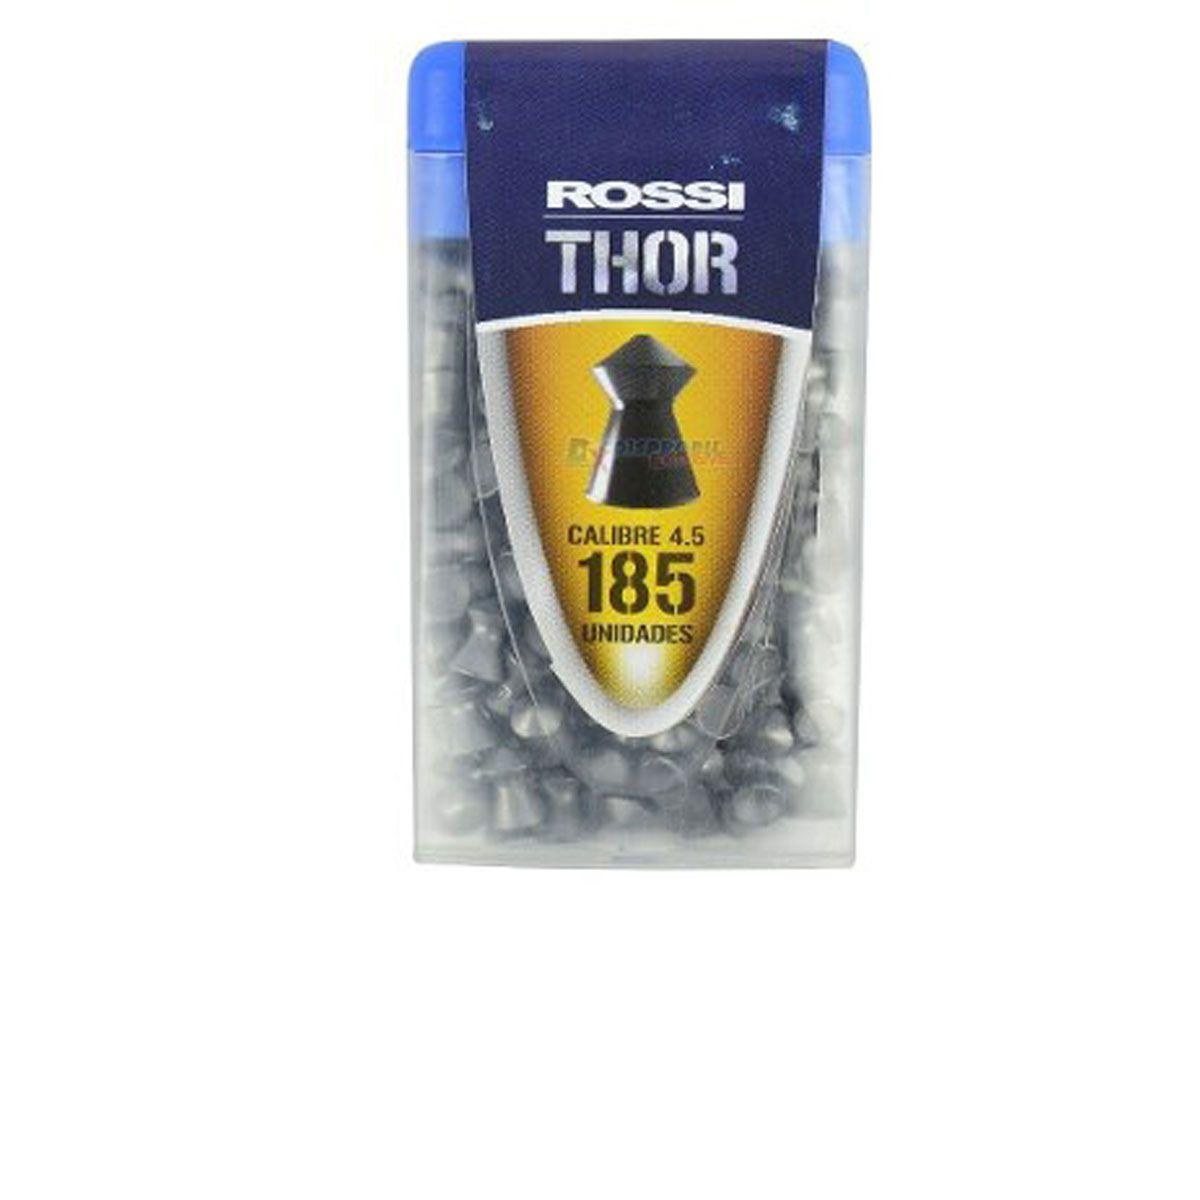 Chumbinho Rossi Thor 4,5mm 185 unidades